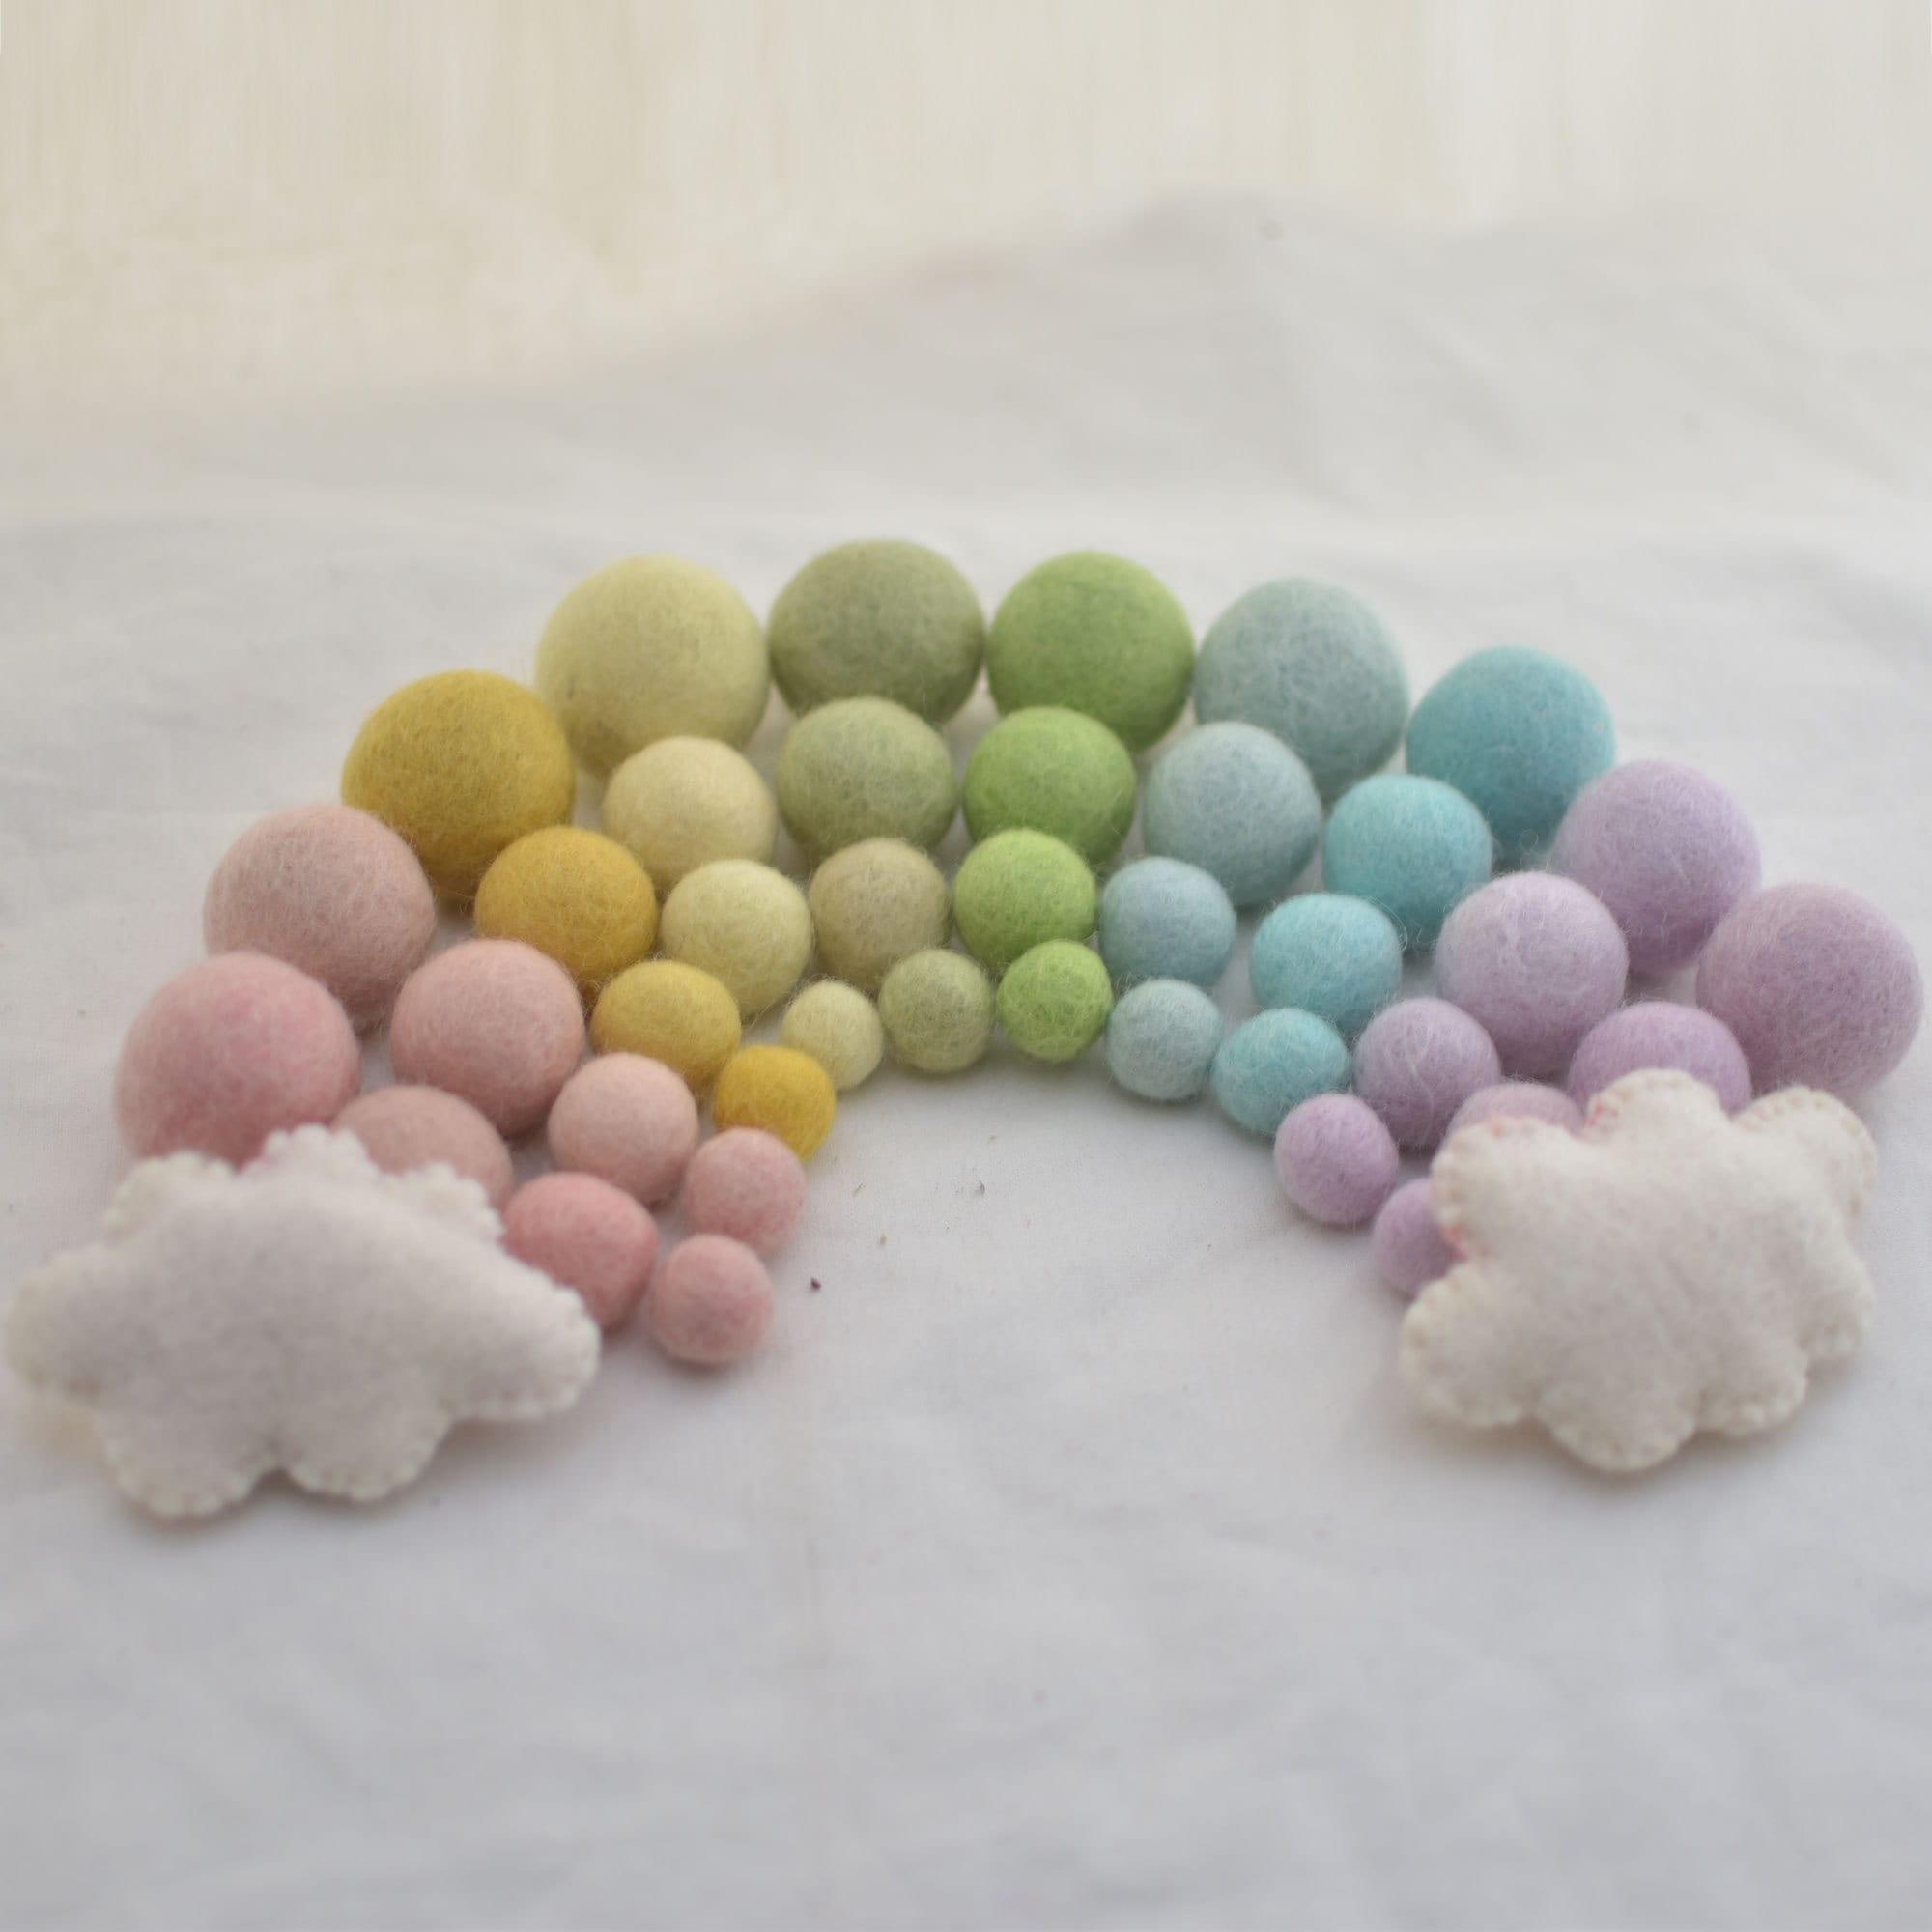 100/% Wool Felt Balls 10 Swirl // Polka Dots Felt Balls Light Latte 2.5cm